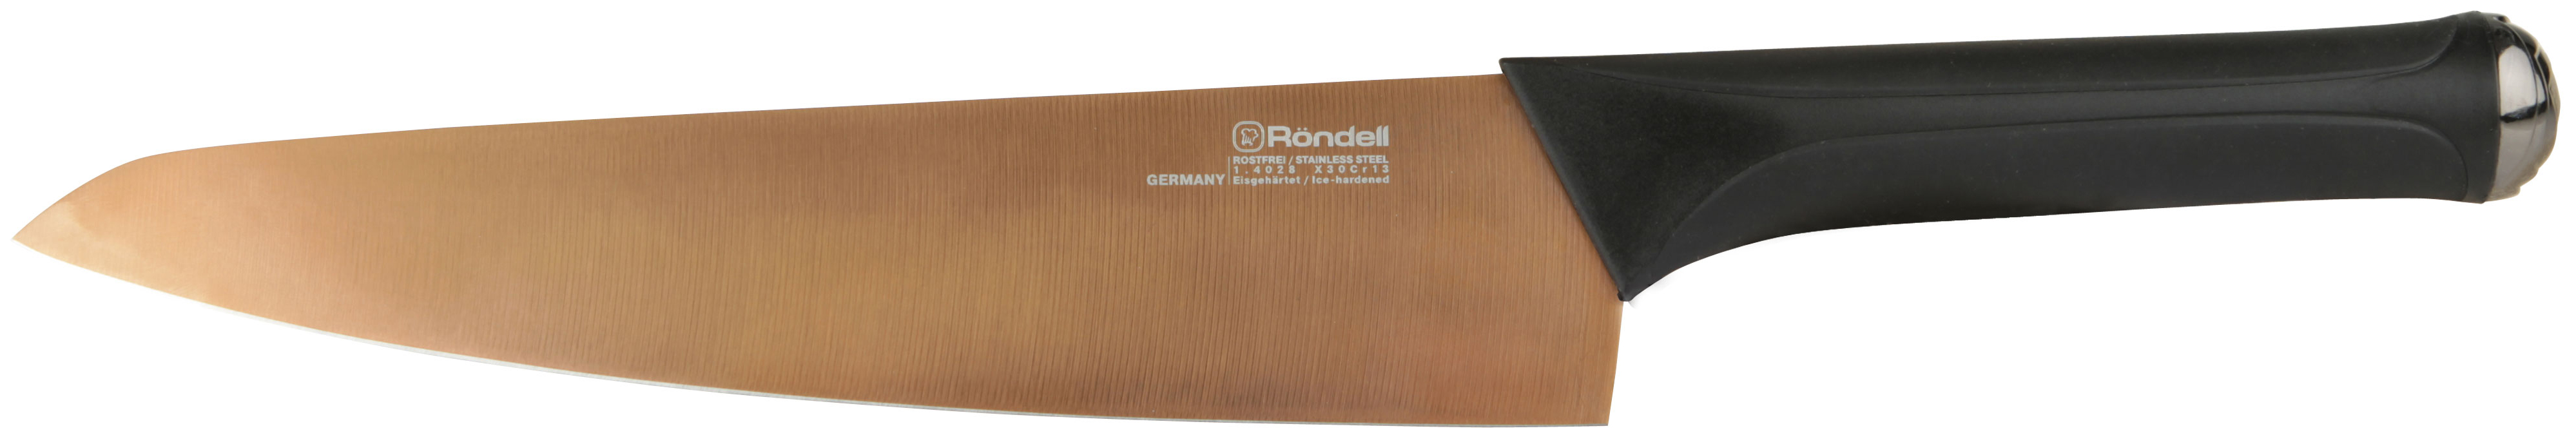 Нож кухонный Röndell RD-690 20 см от Rondell